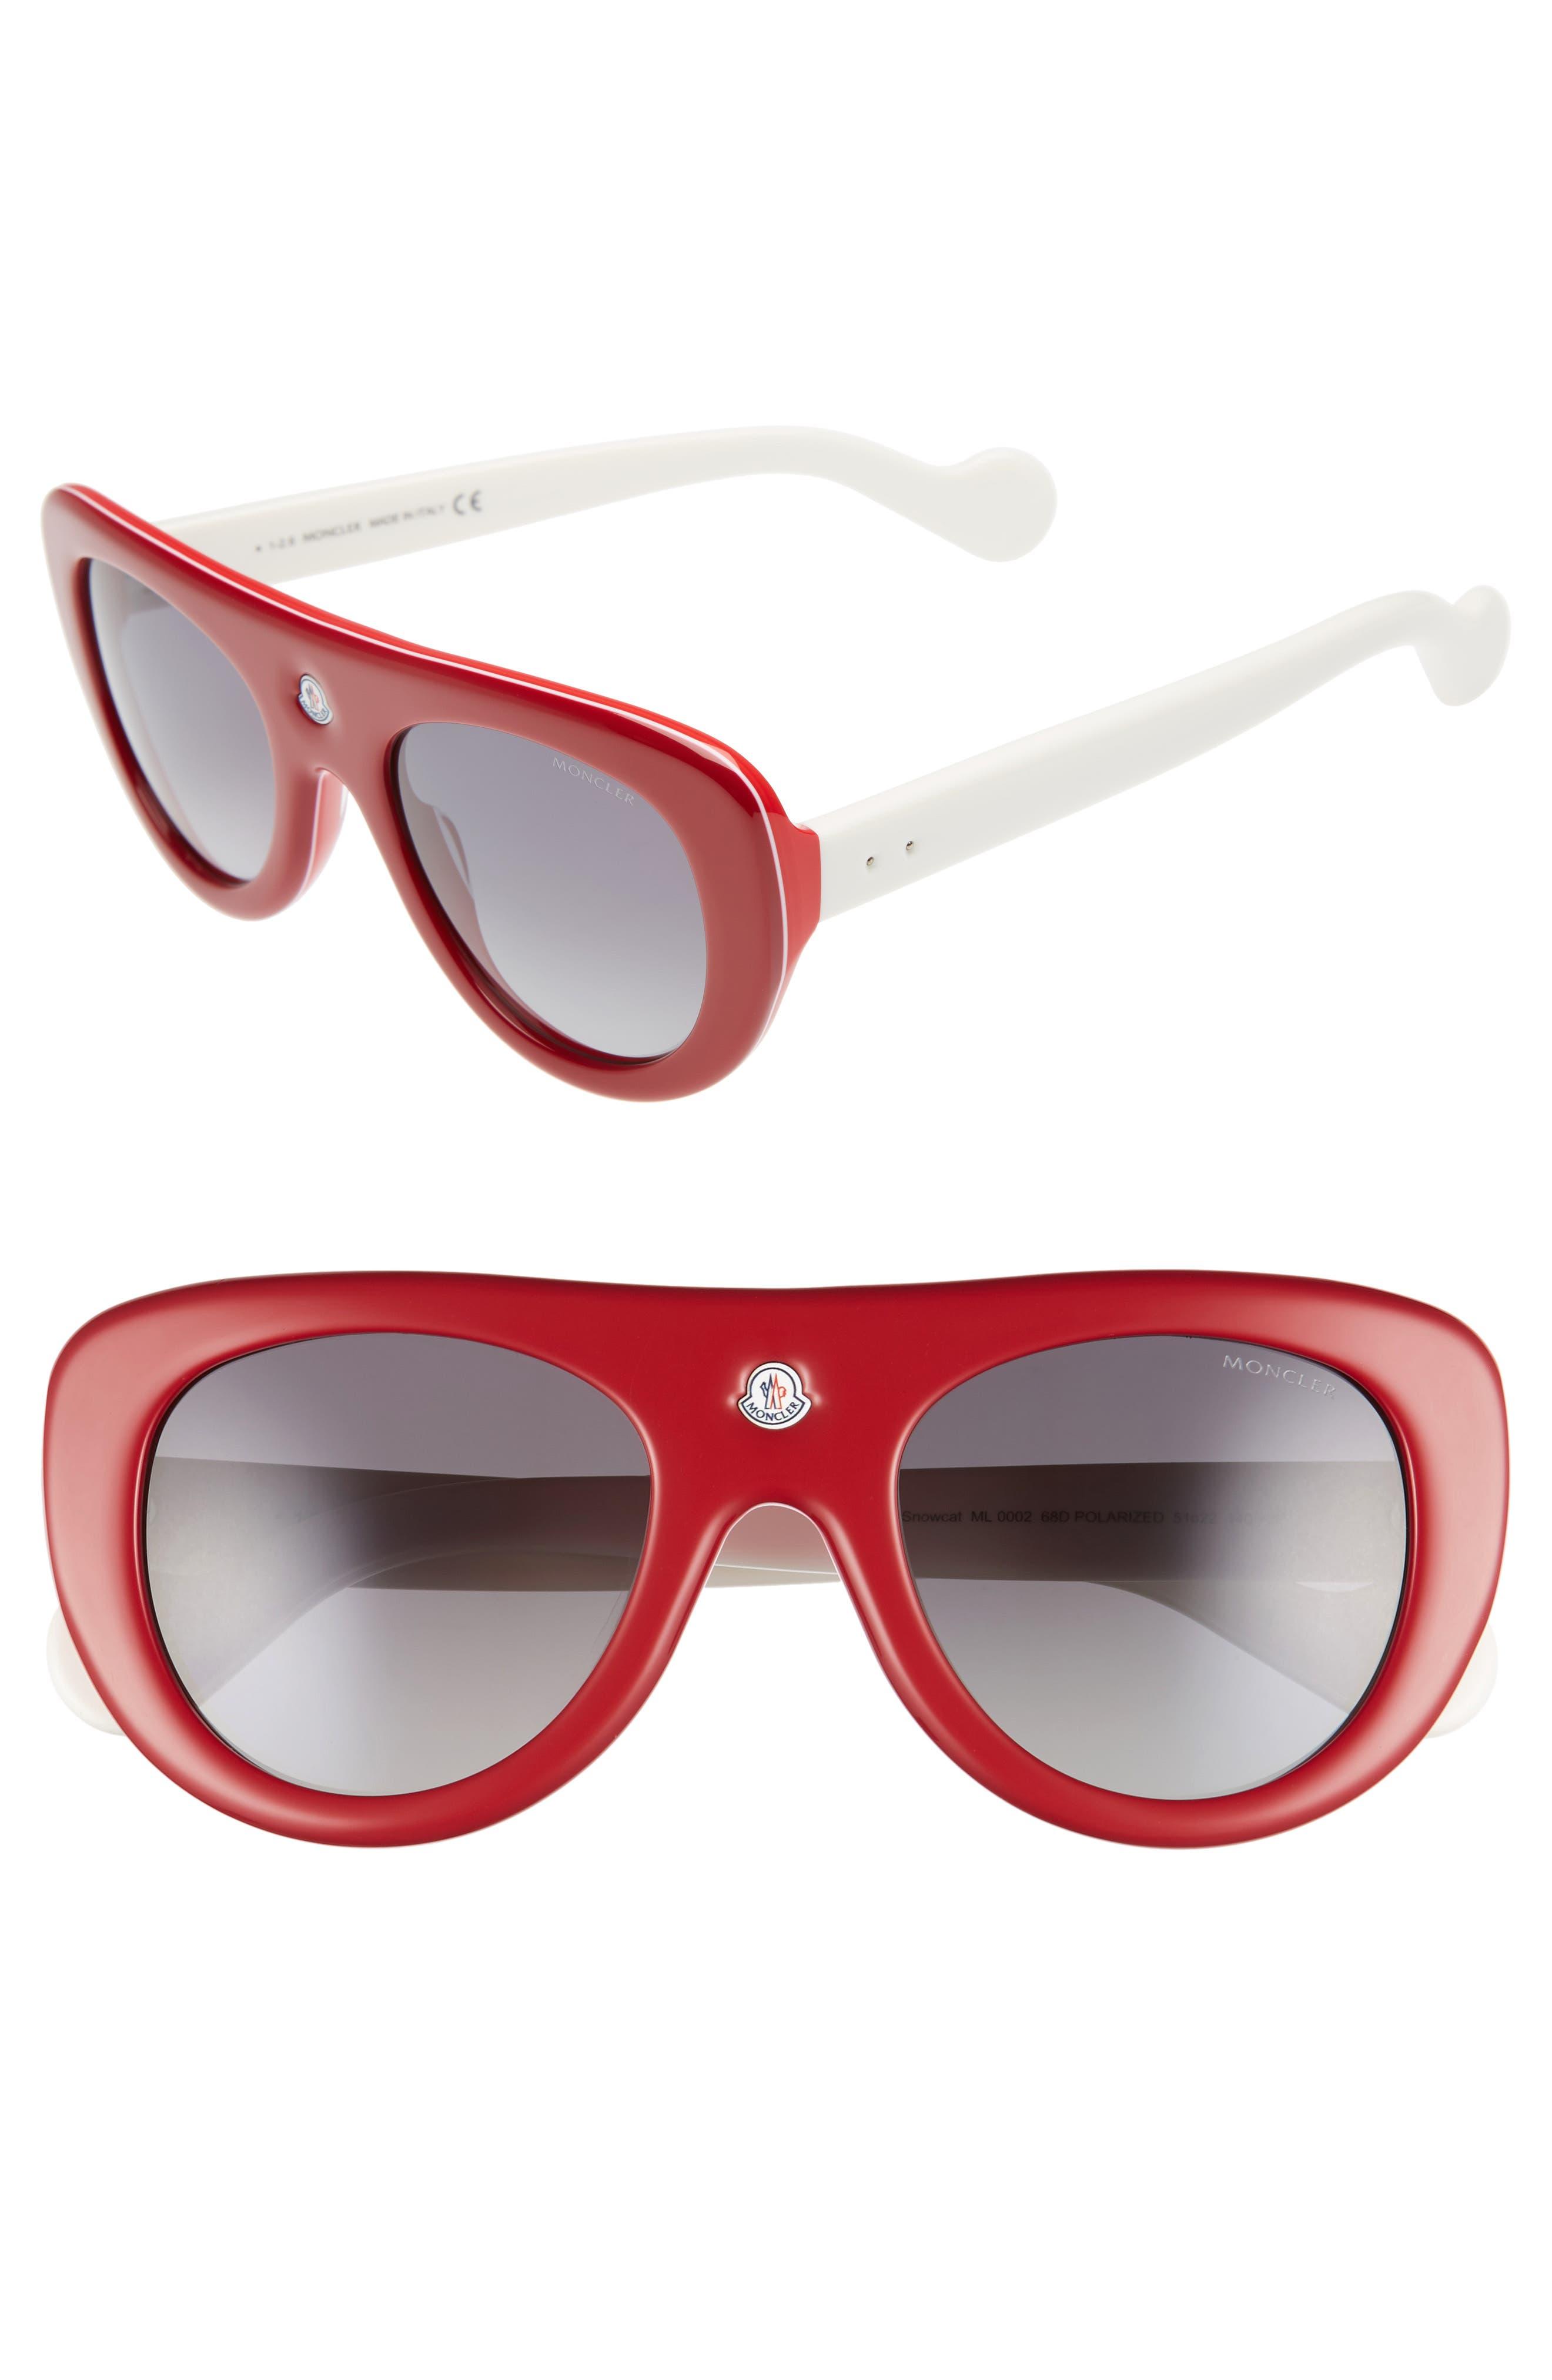 51mm Polarized Two-Tone Geometric Sunglasses,                             Main thumbnail 1, color,                             600